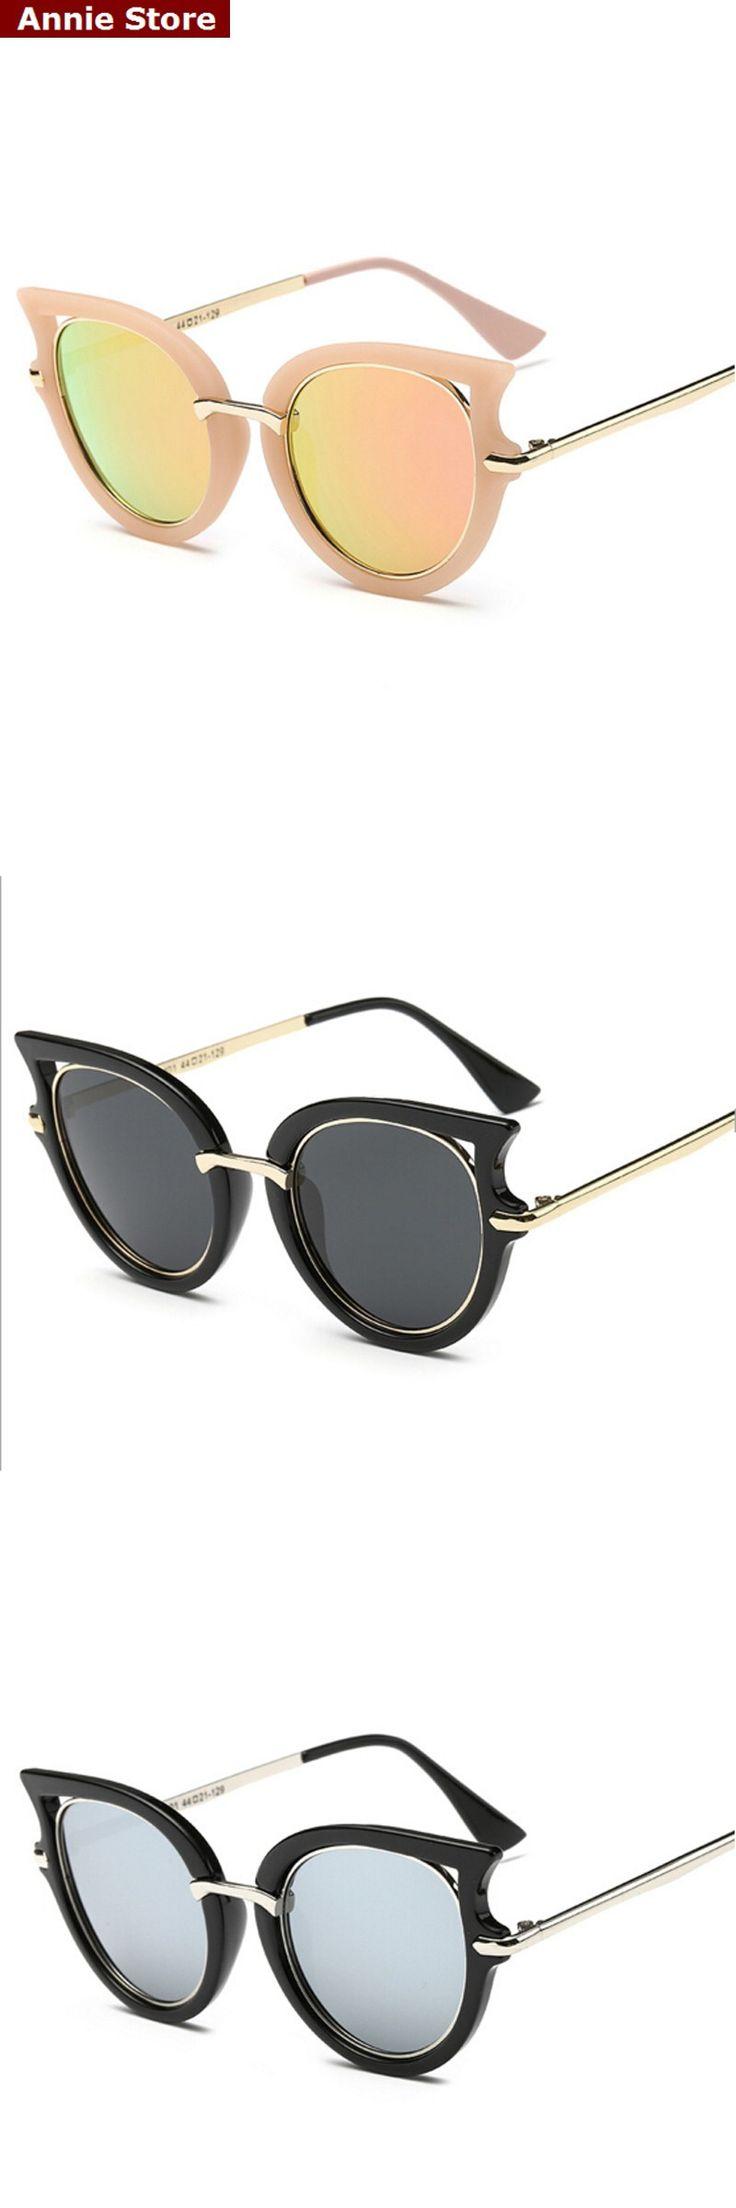 41308bf166 The 25+ best Kids sunglasses ideas on Pinterest